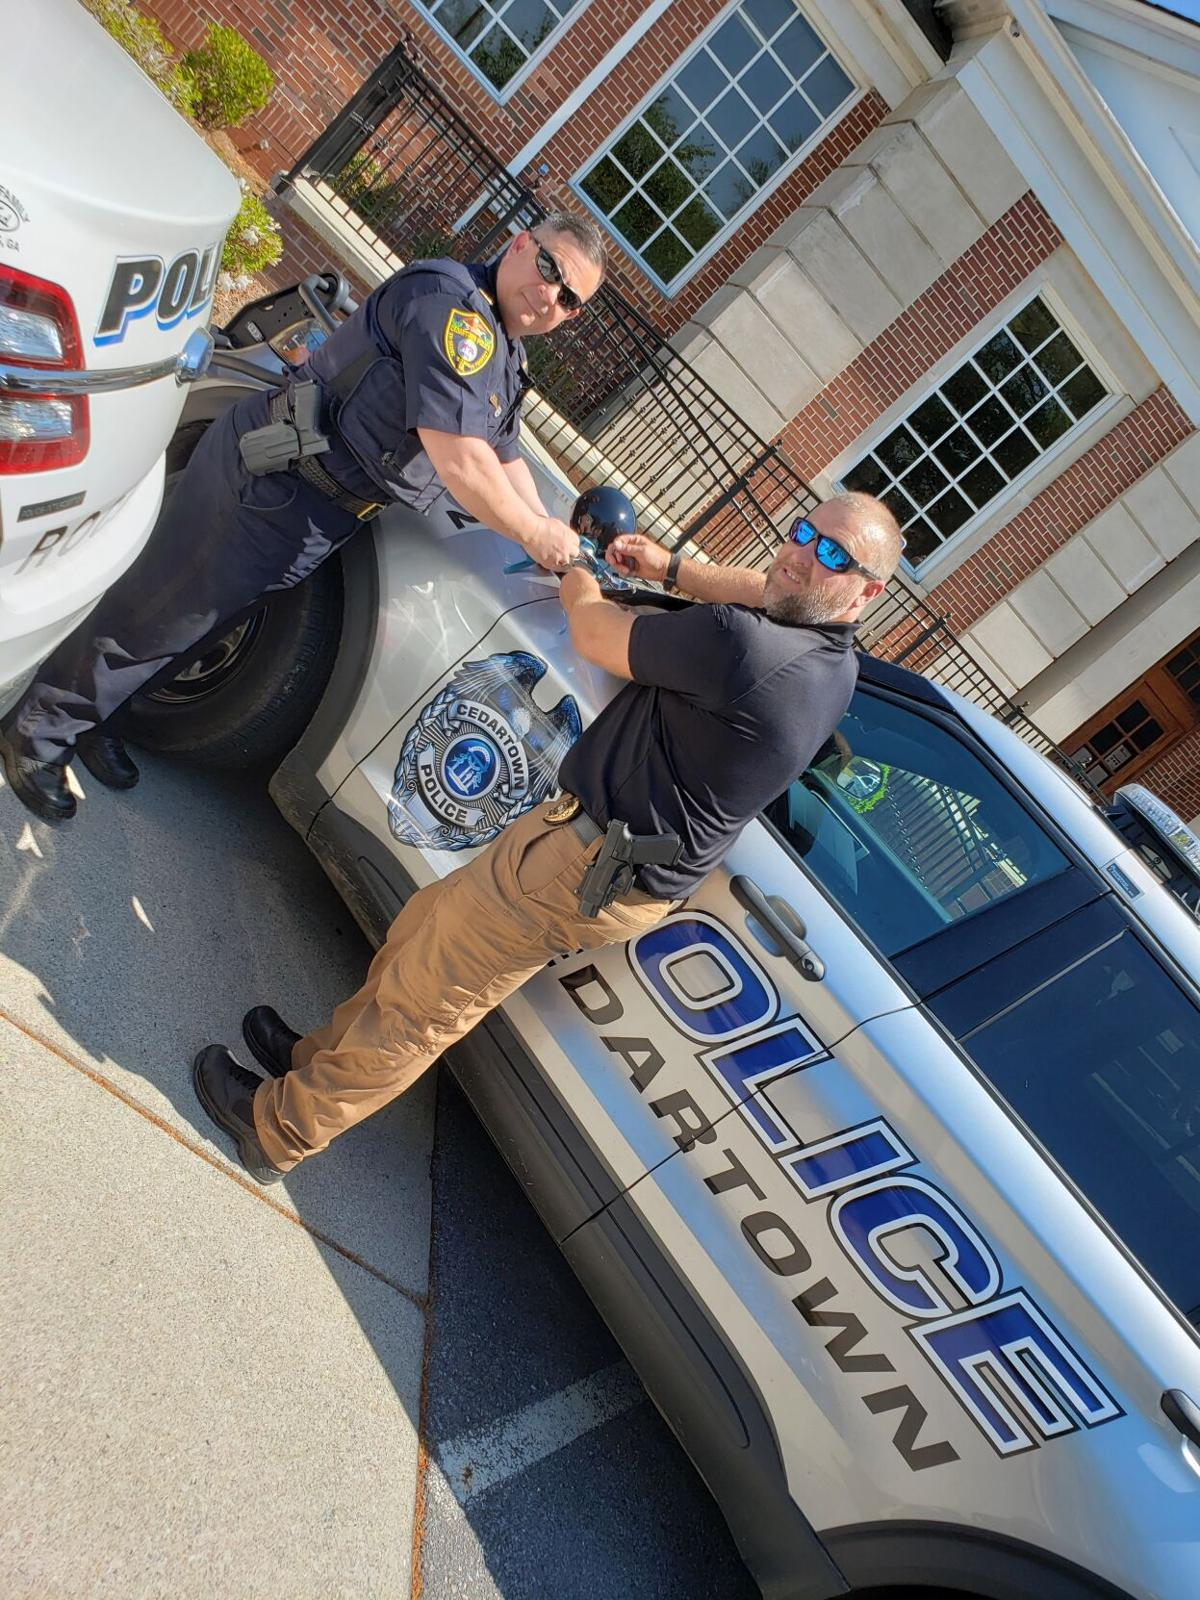 Local law enforcement show support for sexual assault survivors